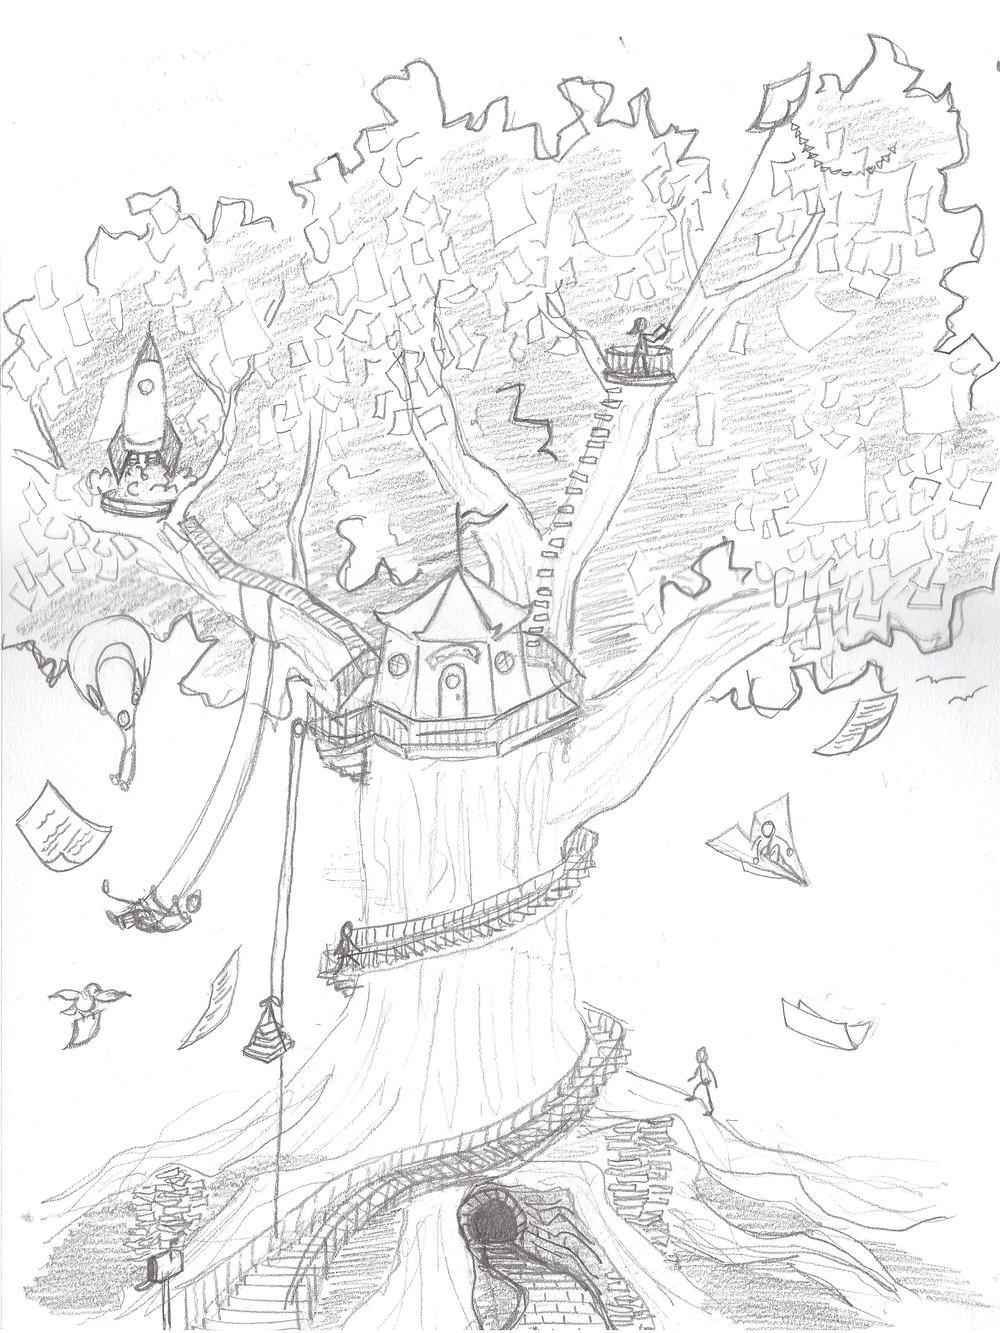 proposal sketch.jpg